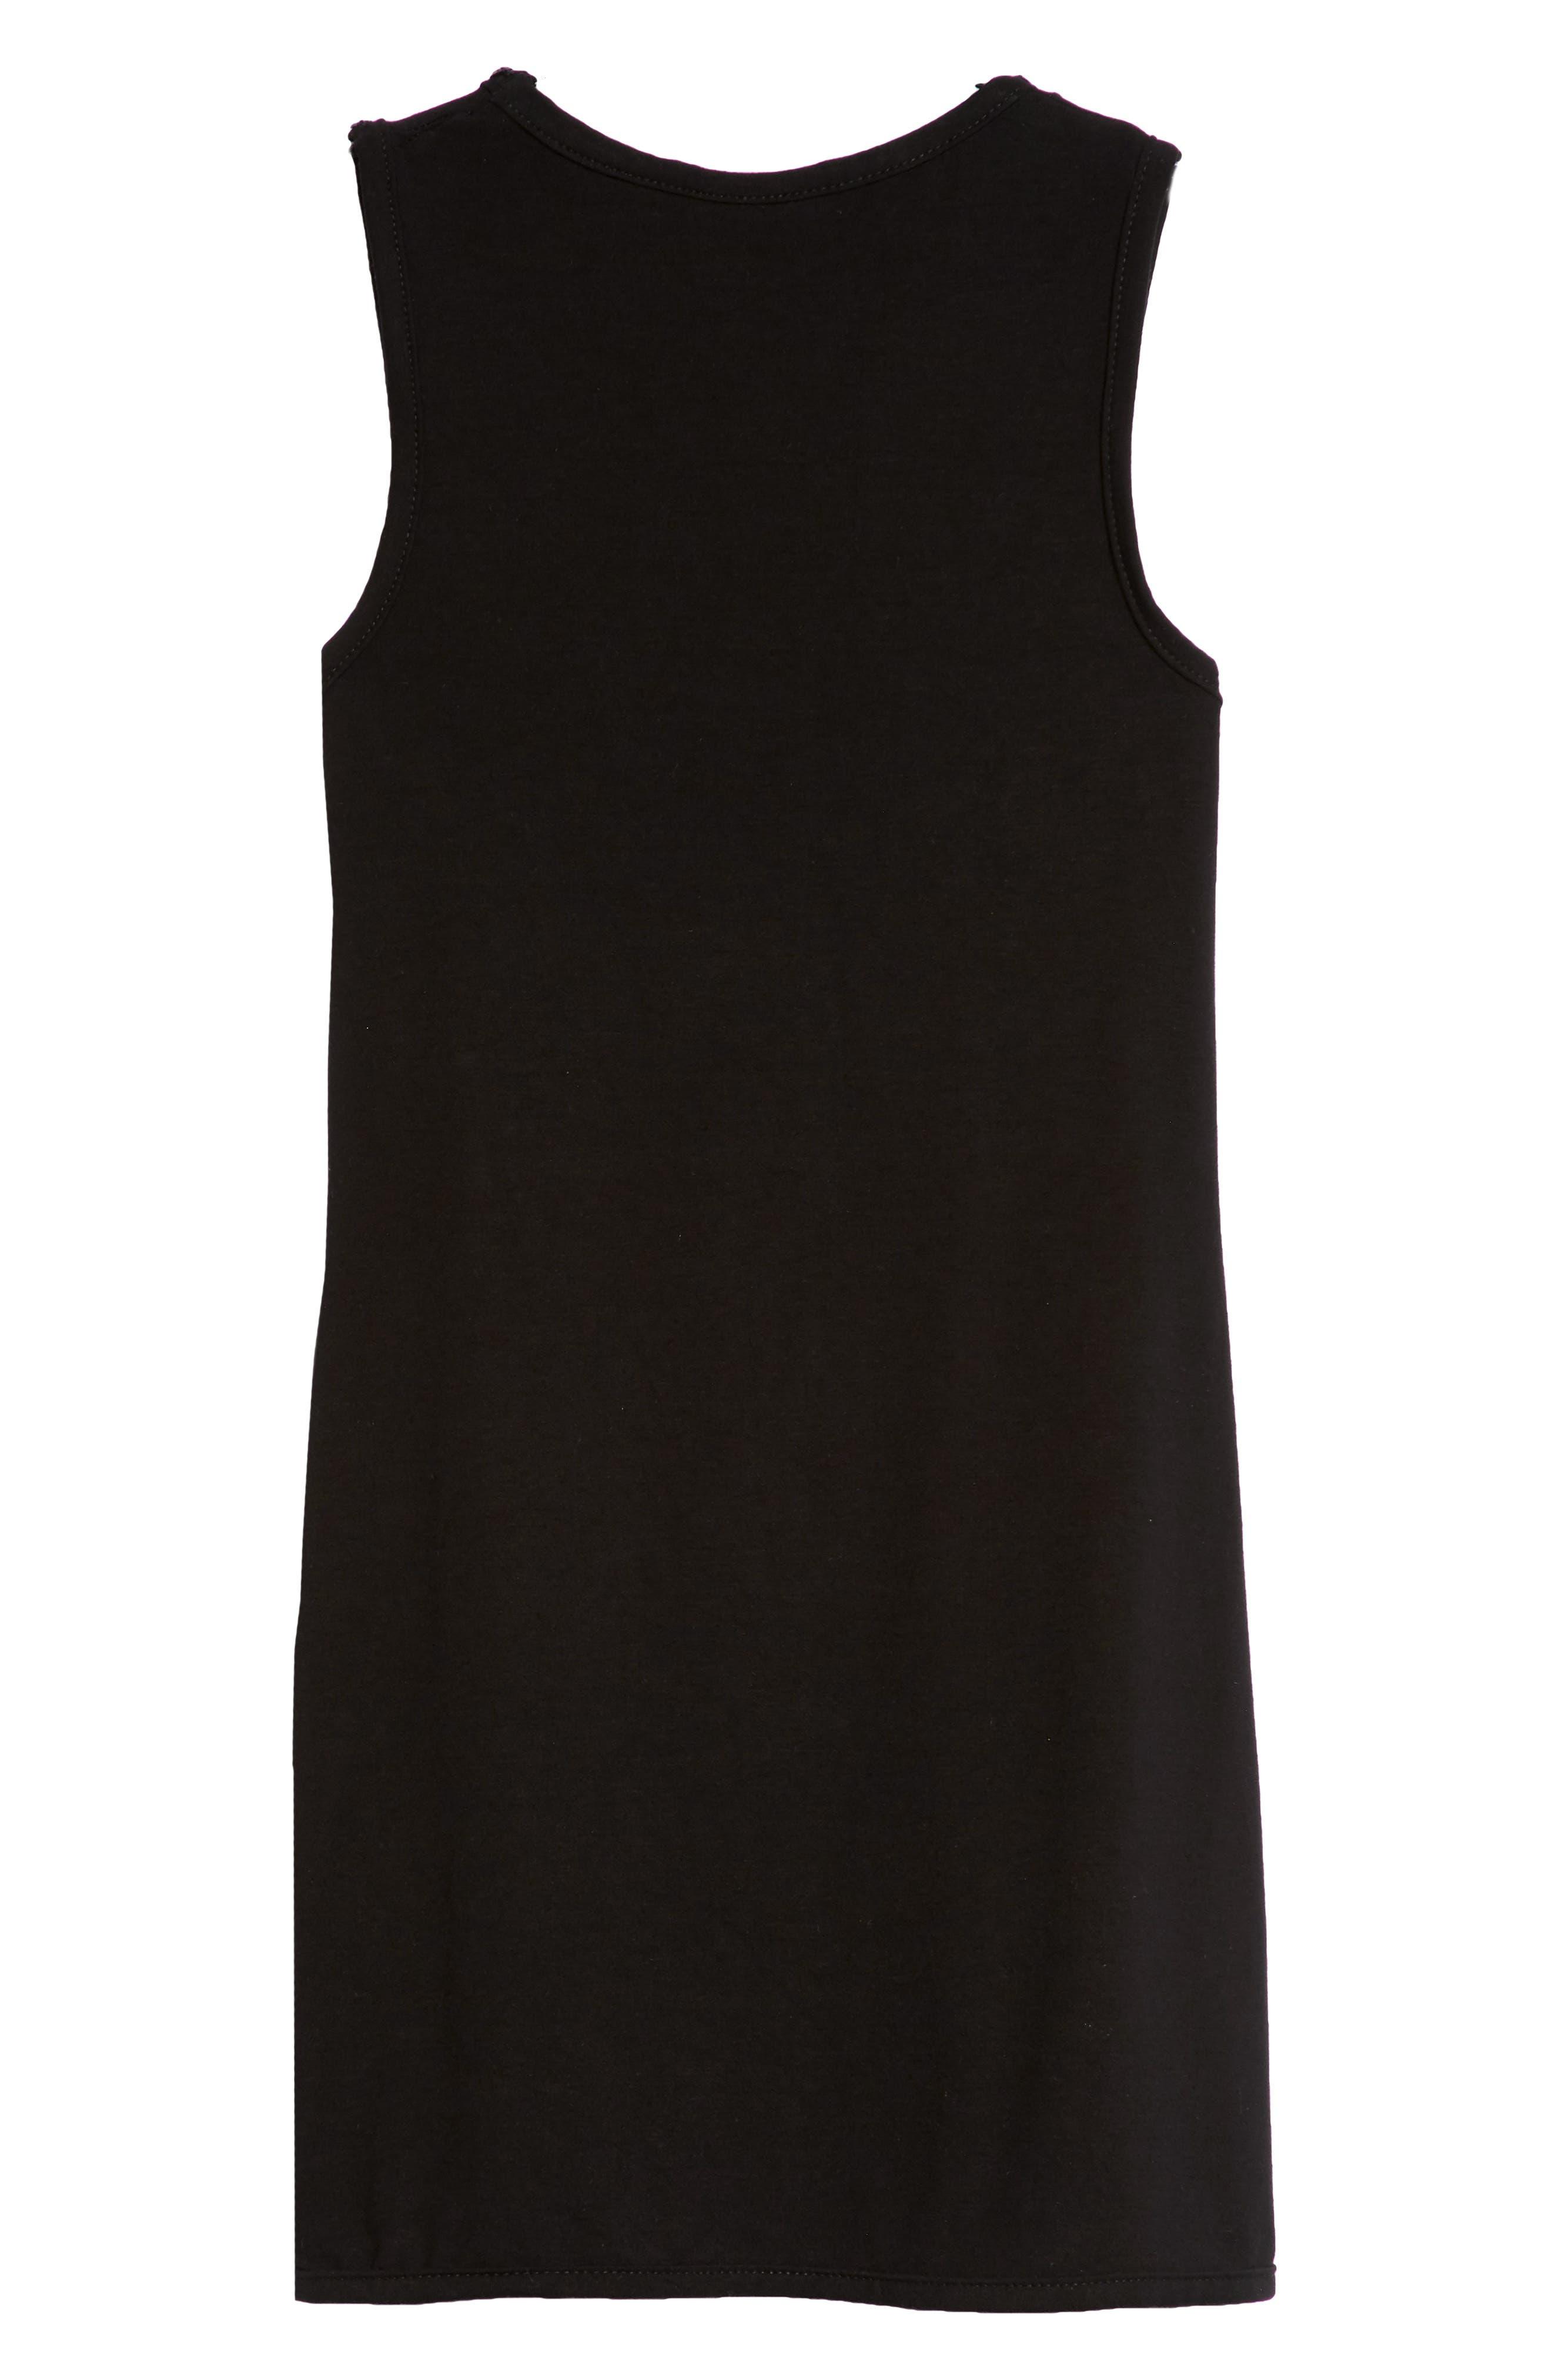 Crystal Studded Tank Dress,                             Alternate thumbnail 2, color,                             001